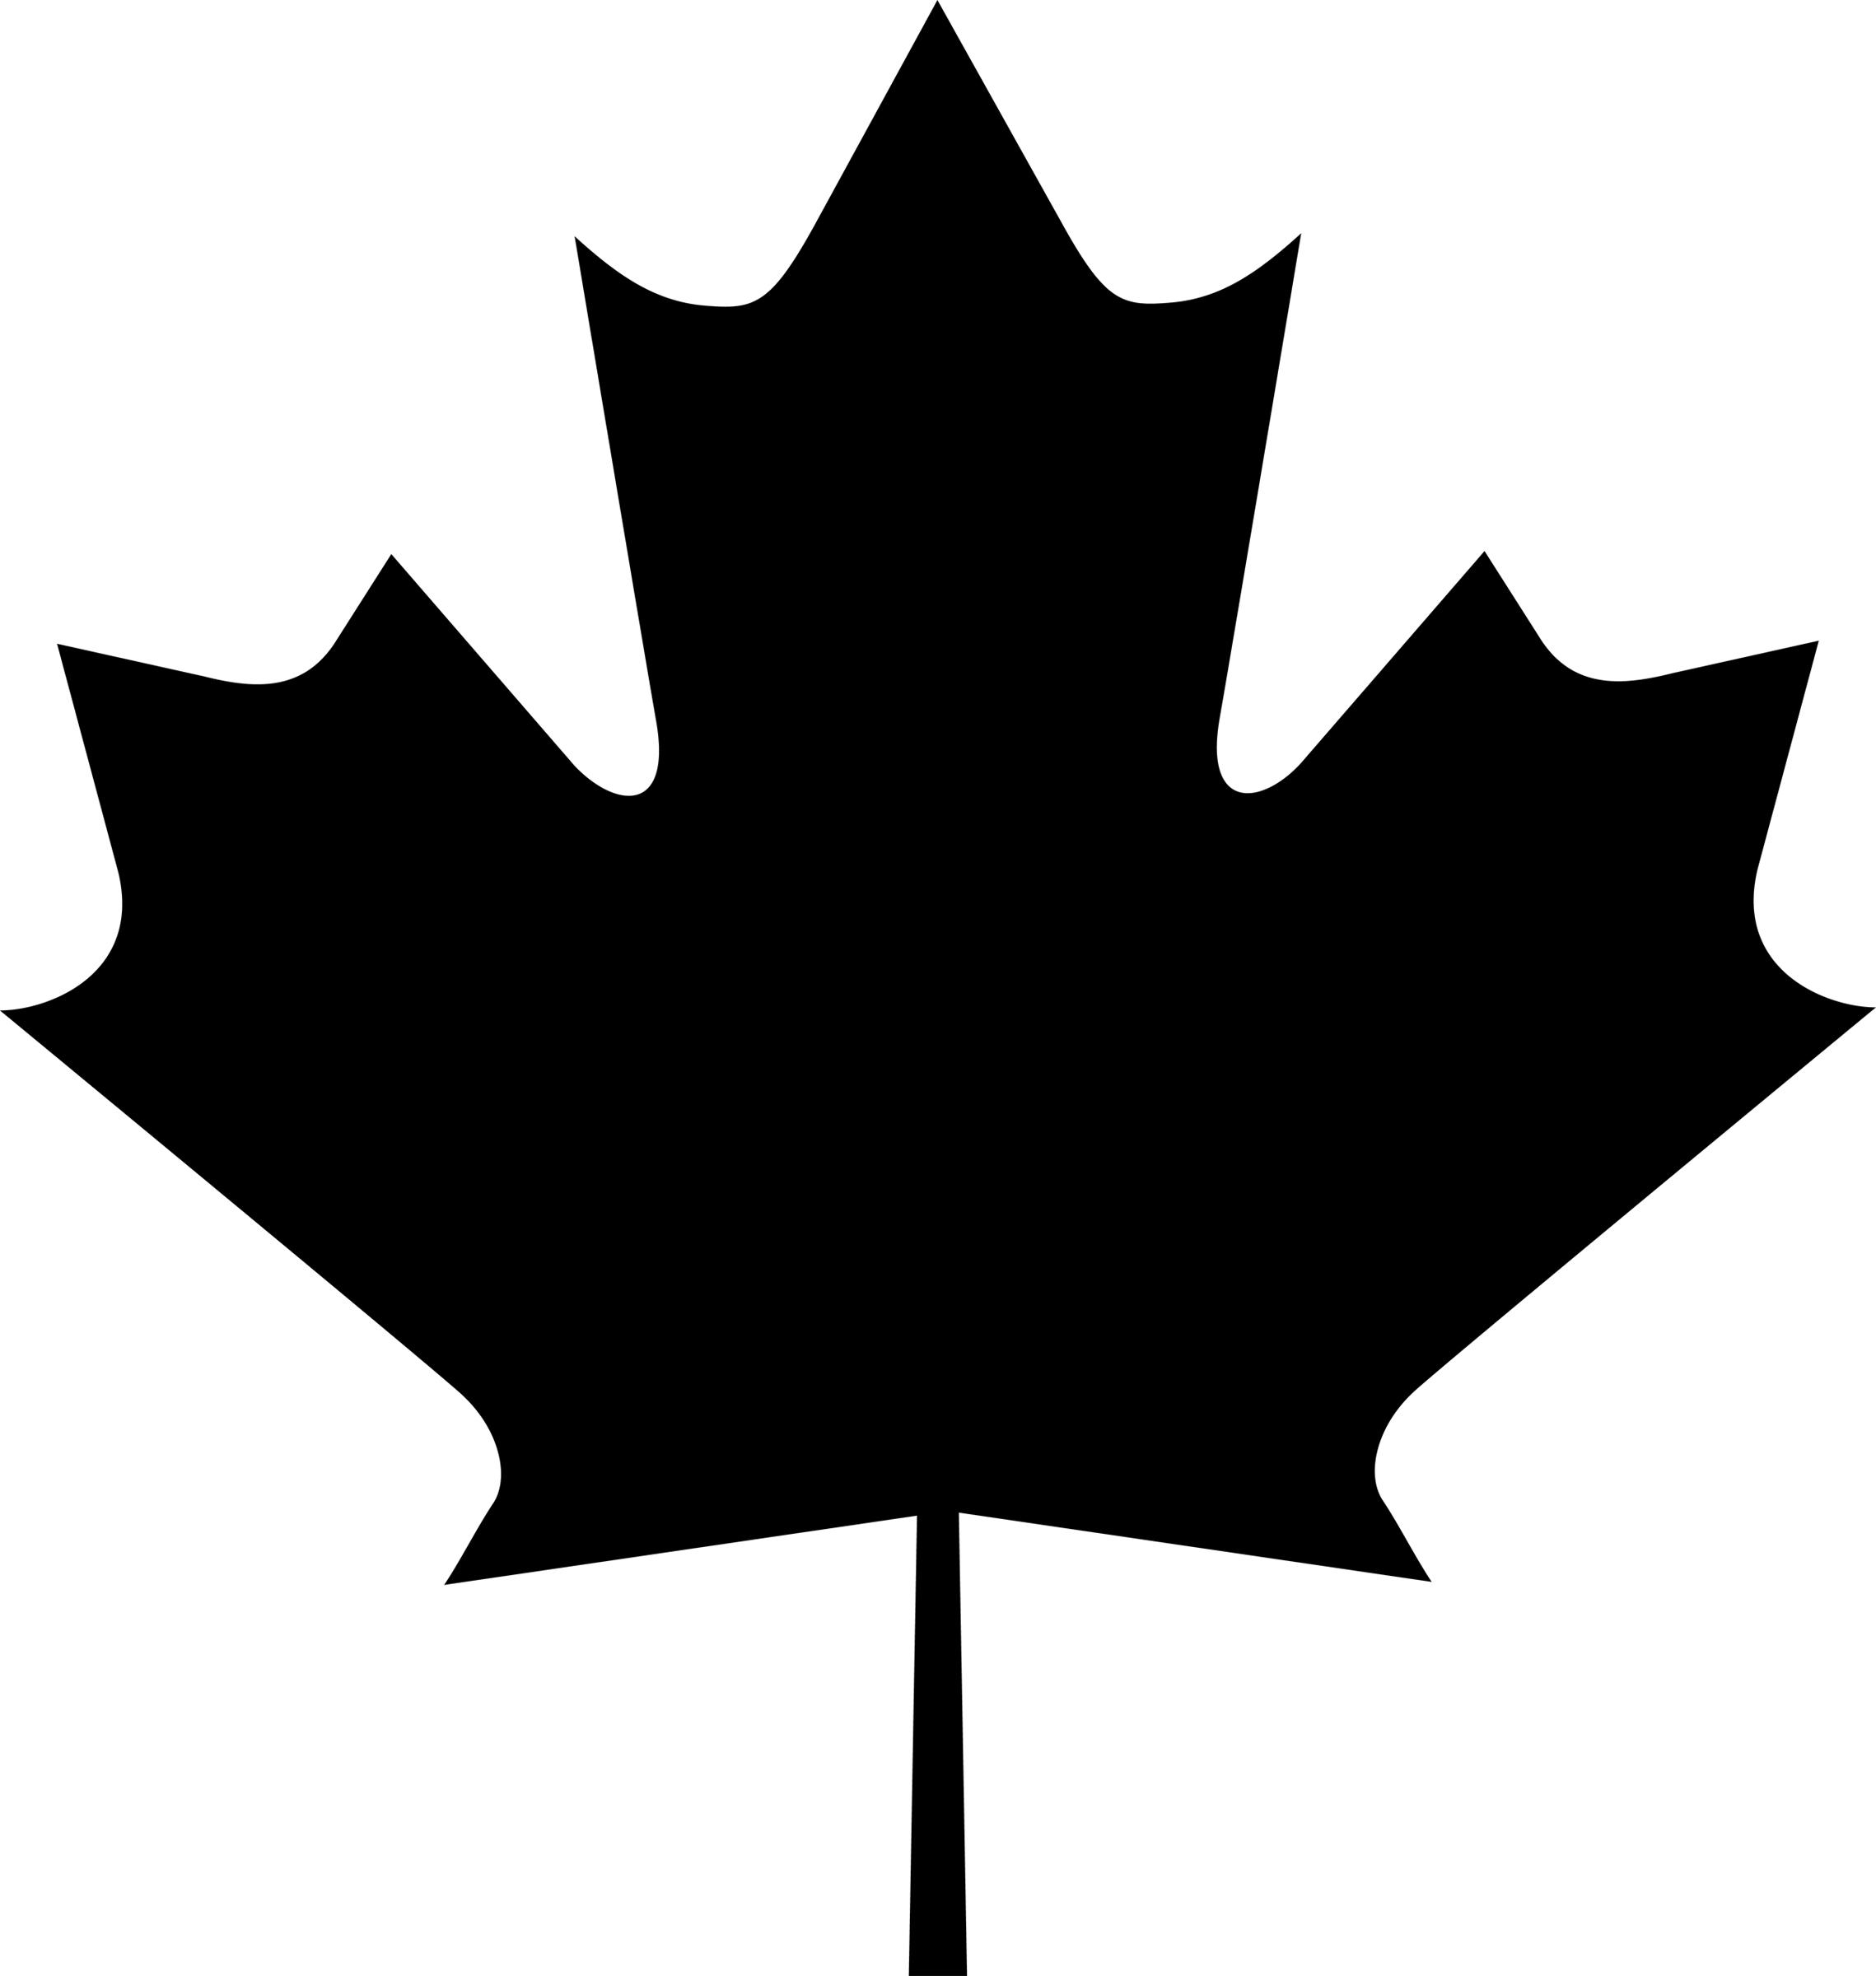 Maple Leaf Go Canada Clip Art-Maple Leaf Go Canada Clip Art-16